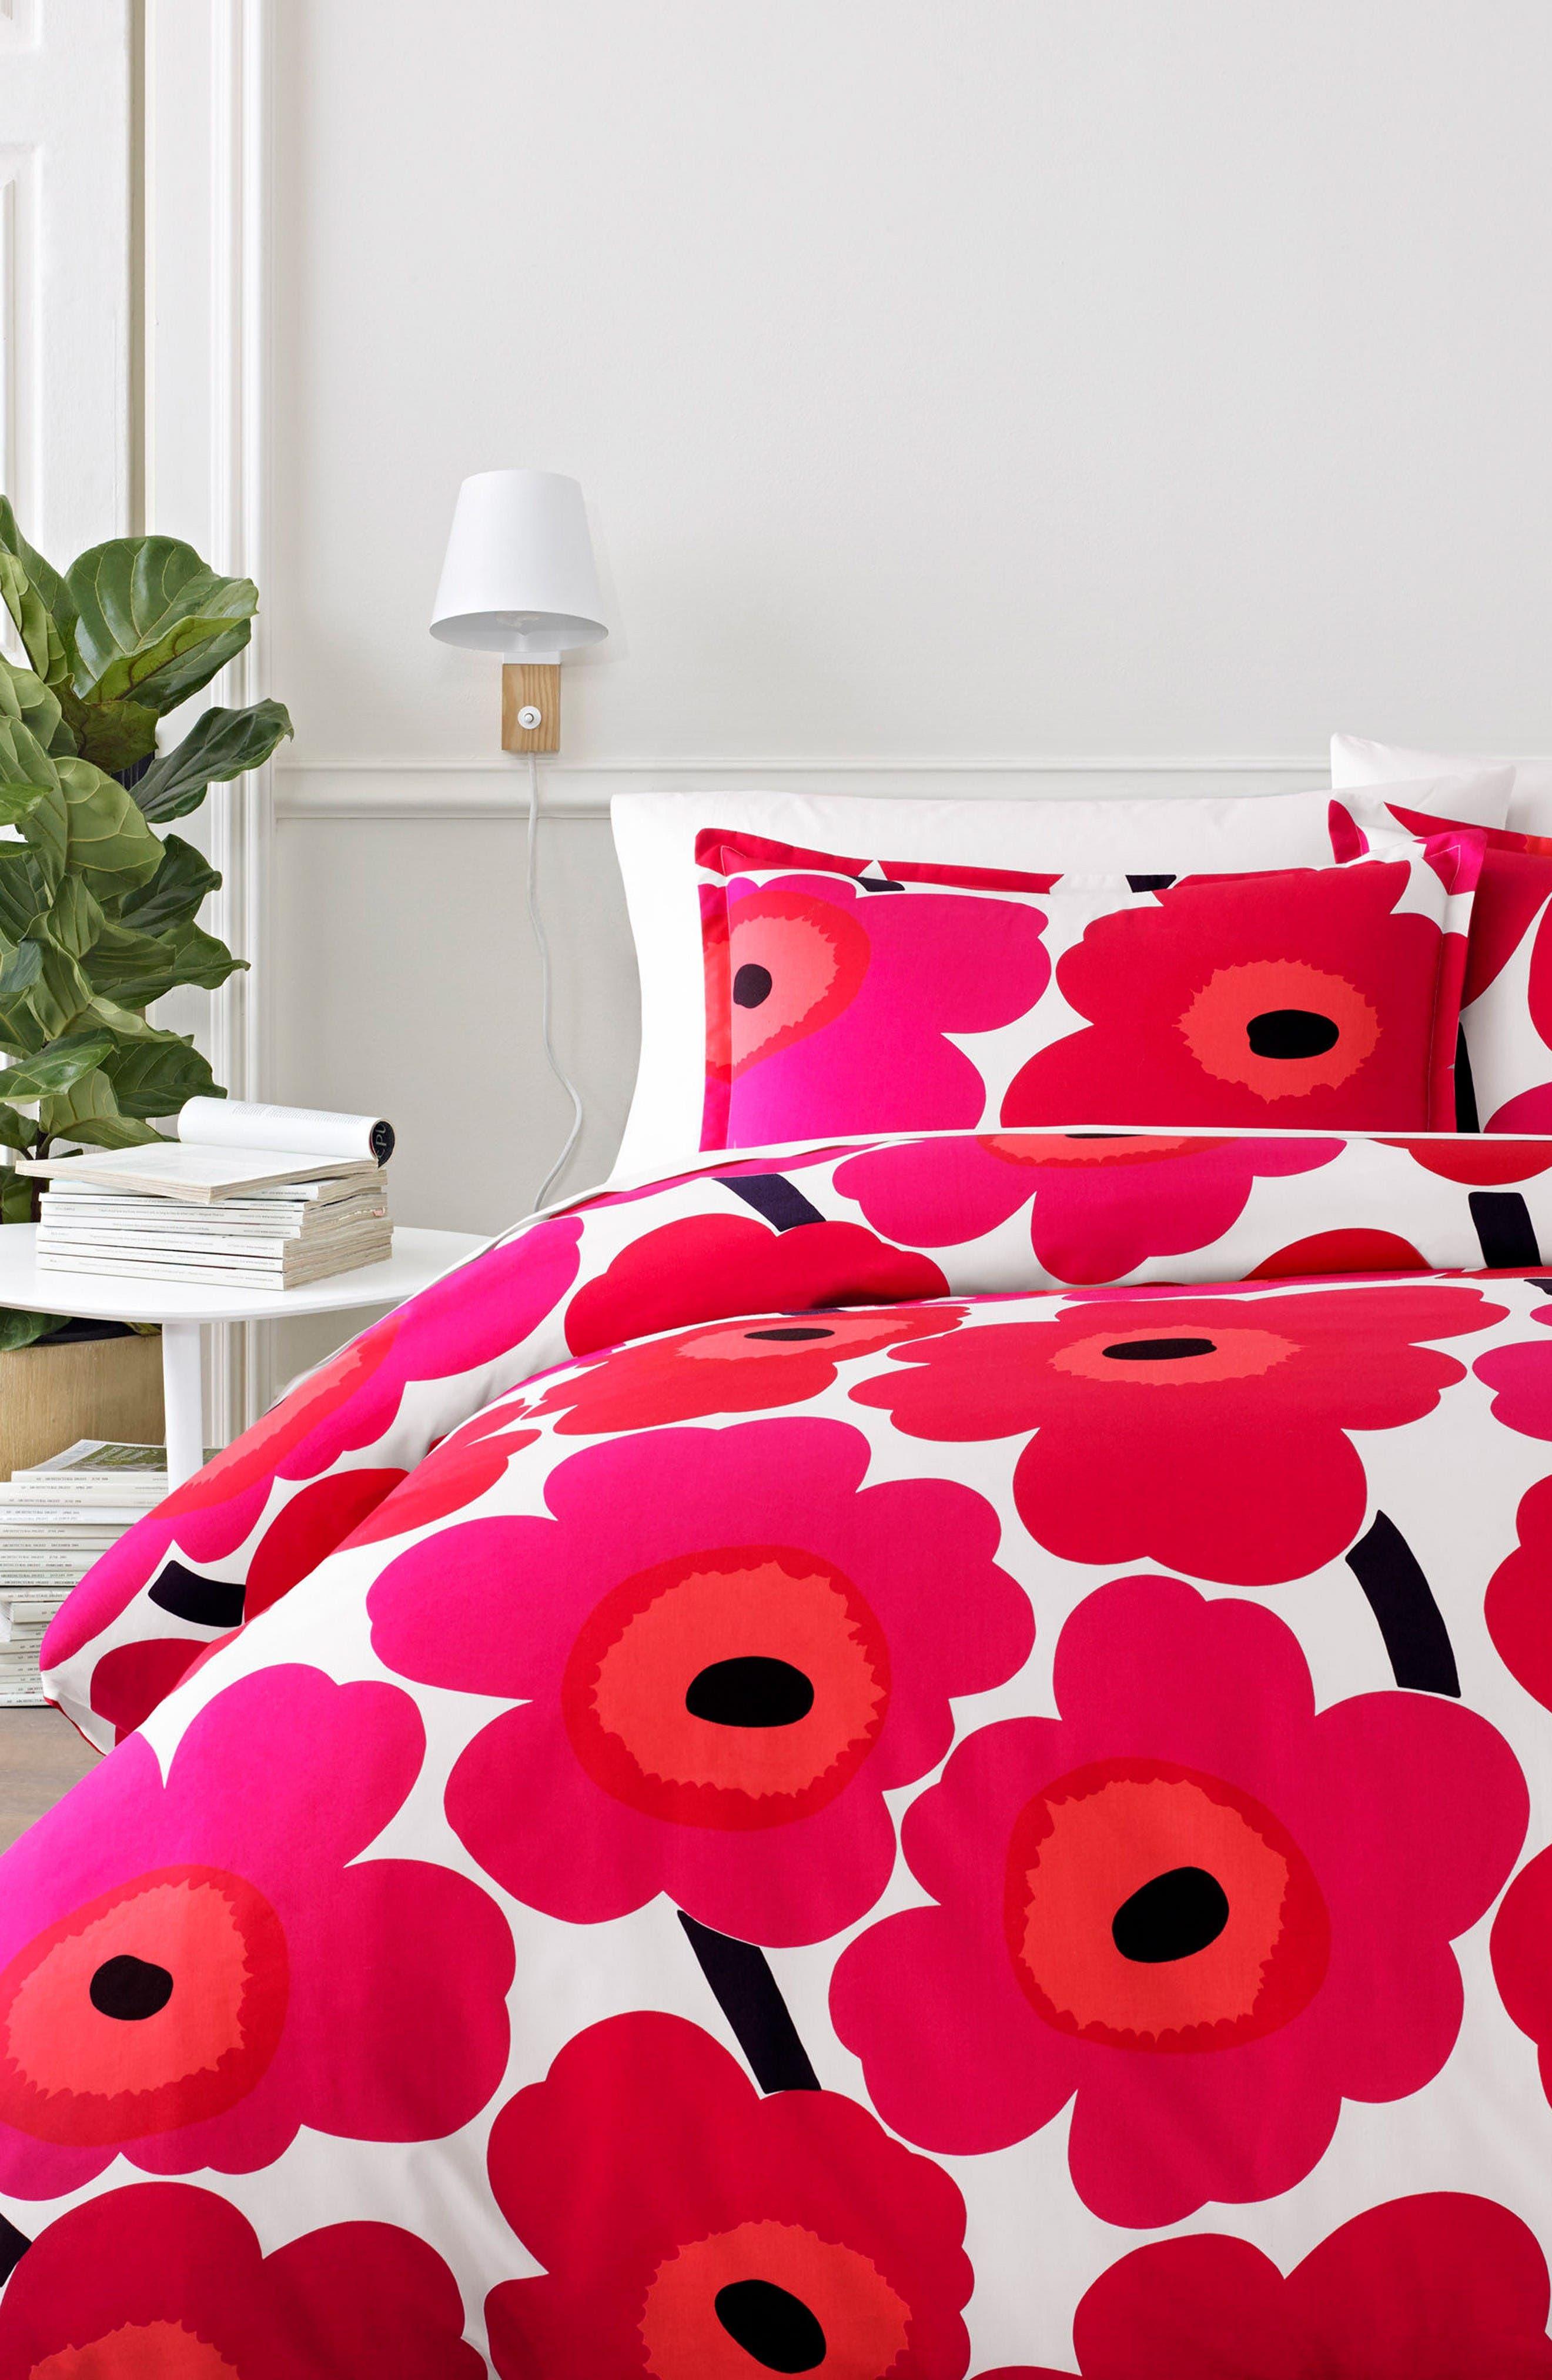 Main Image - Marimekko Unikko Comforter & Sham Set